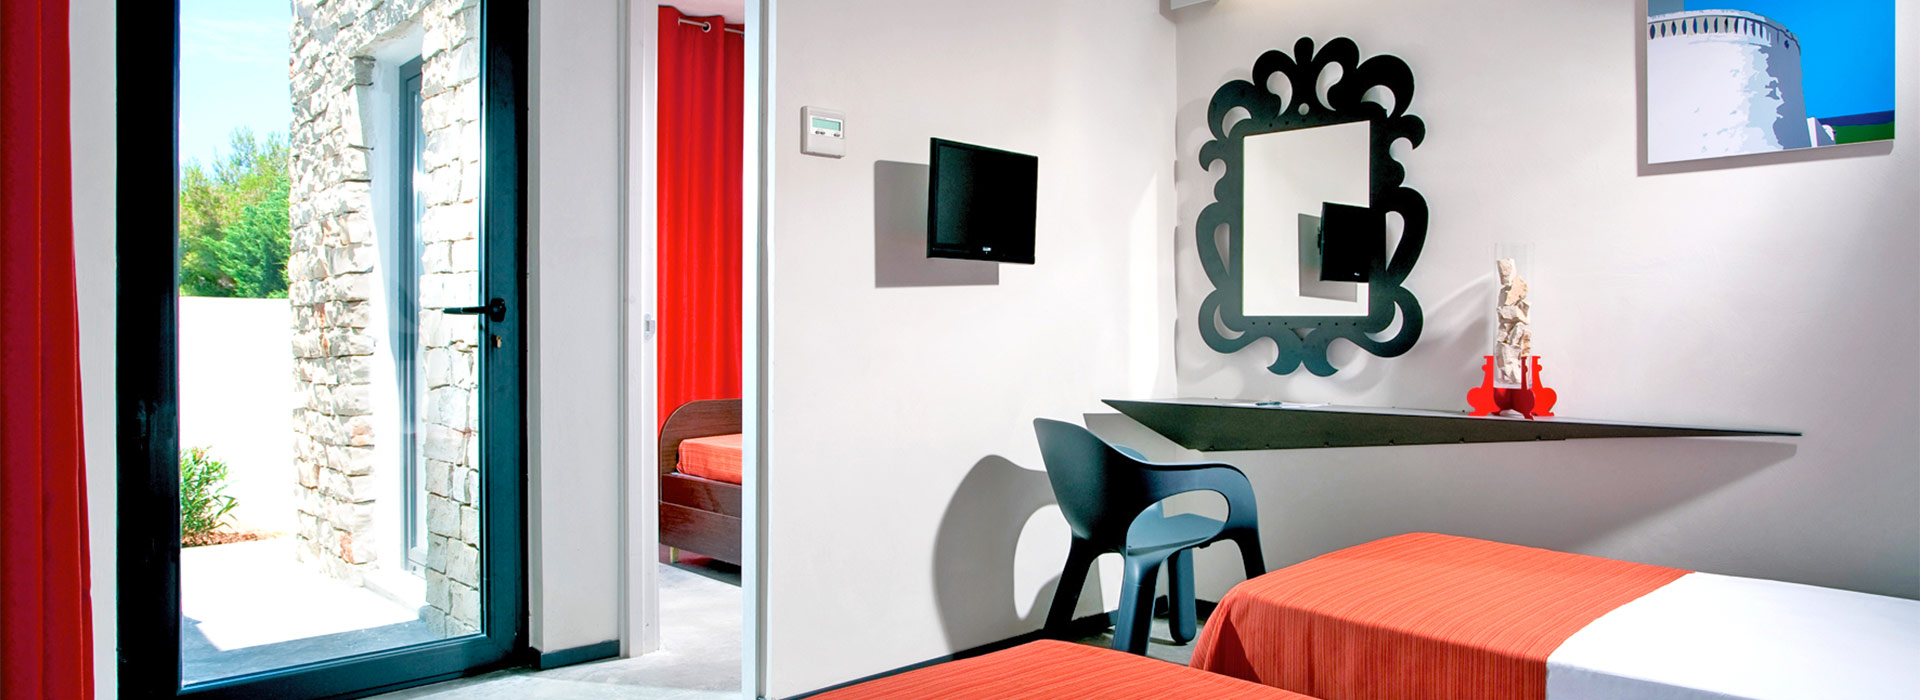 Resort 4* nell'alto Salento